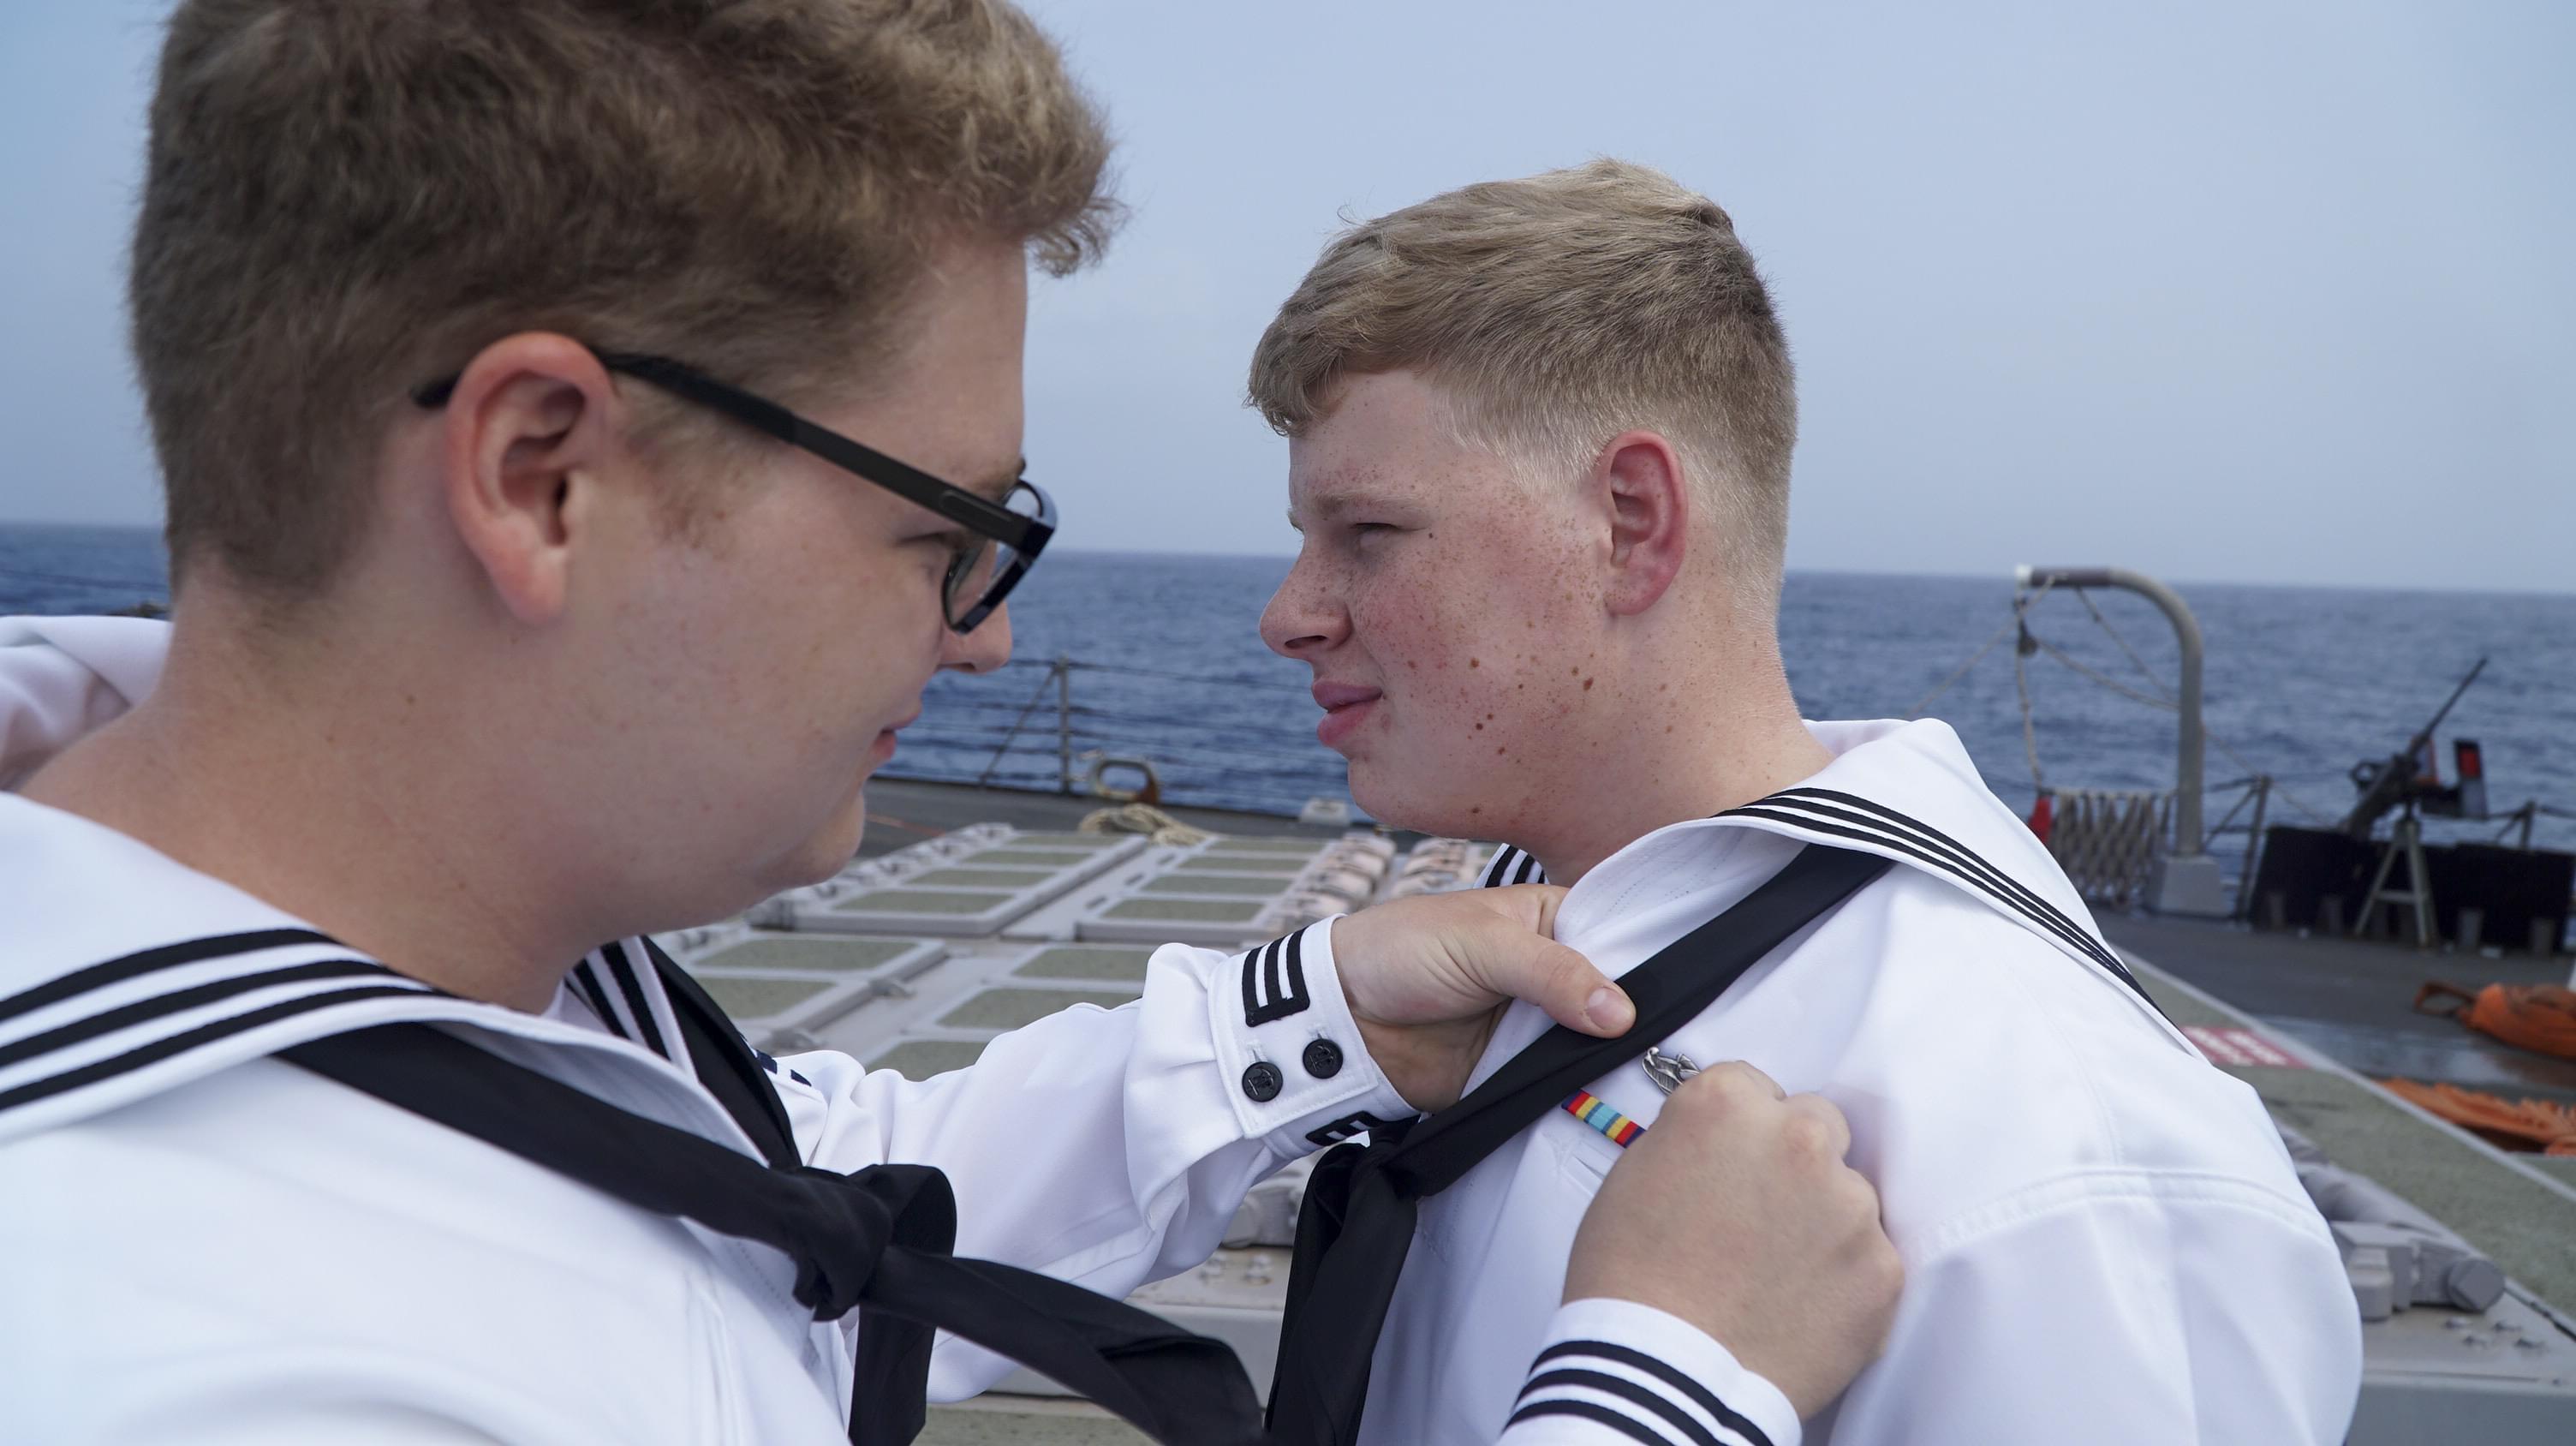 Virginia Beach Native Receives Surface Warfare Specialist Insignia Aboard USS James E. Williams